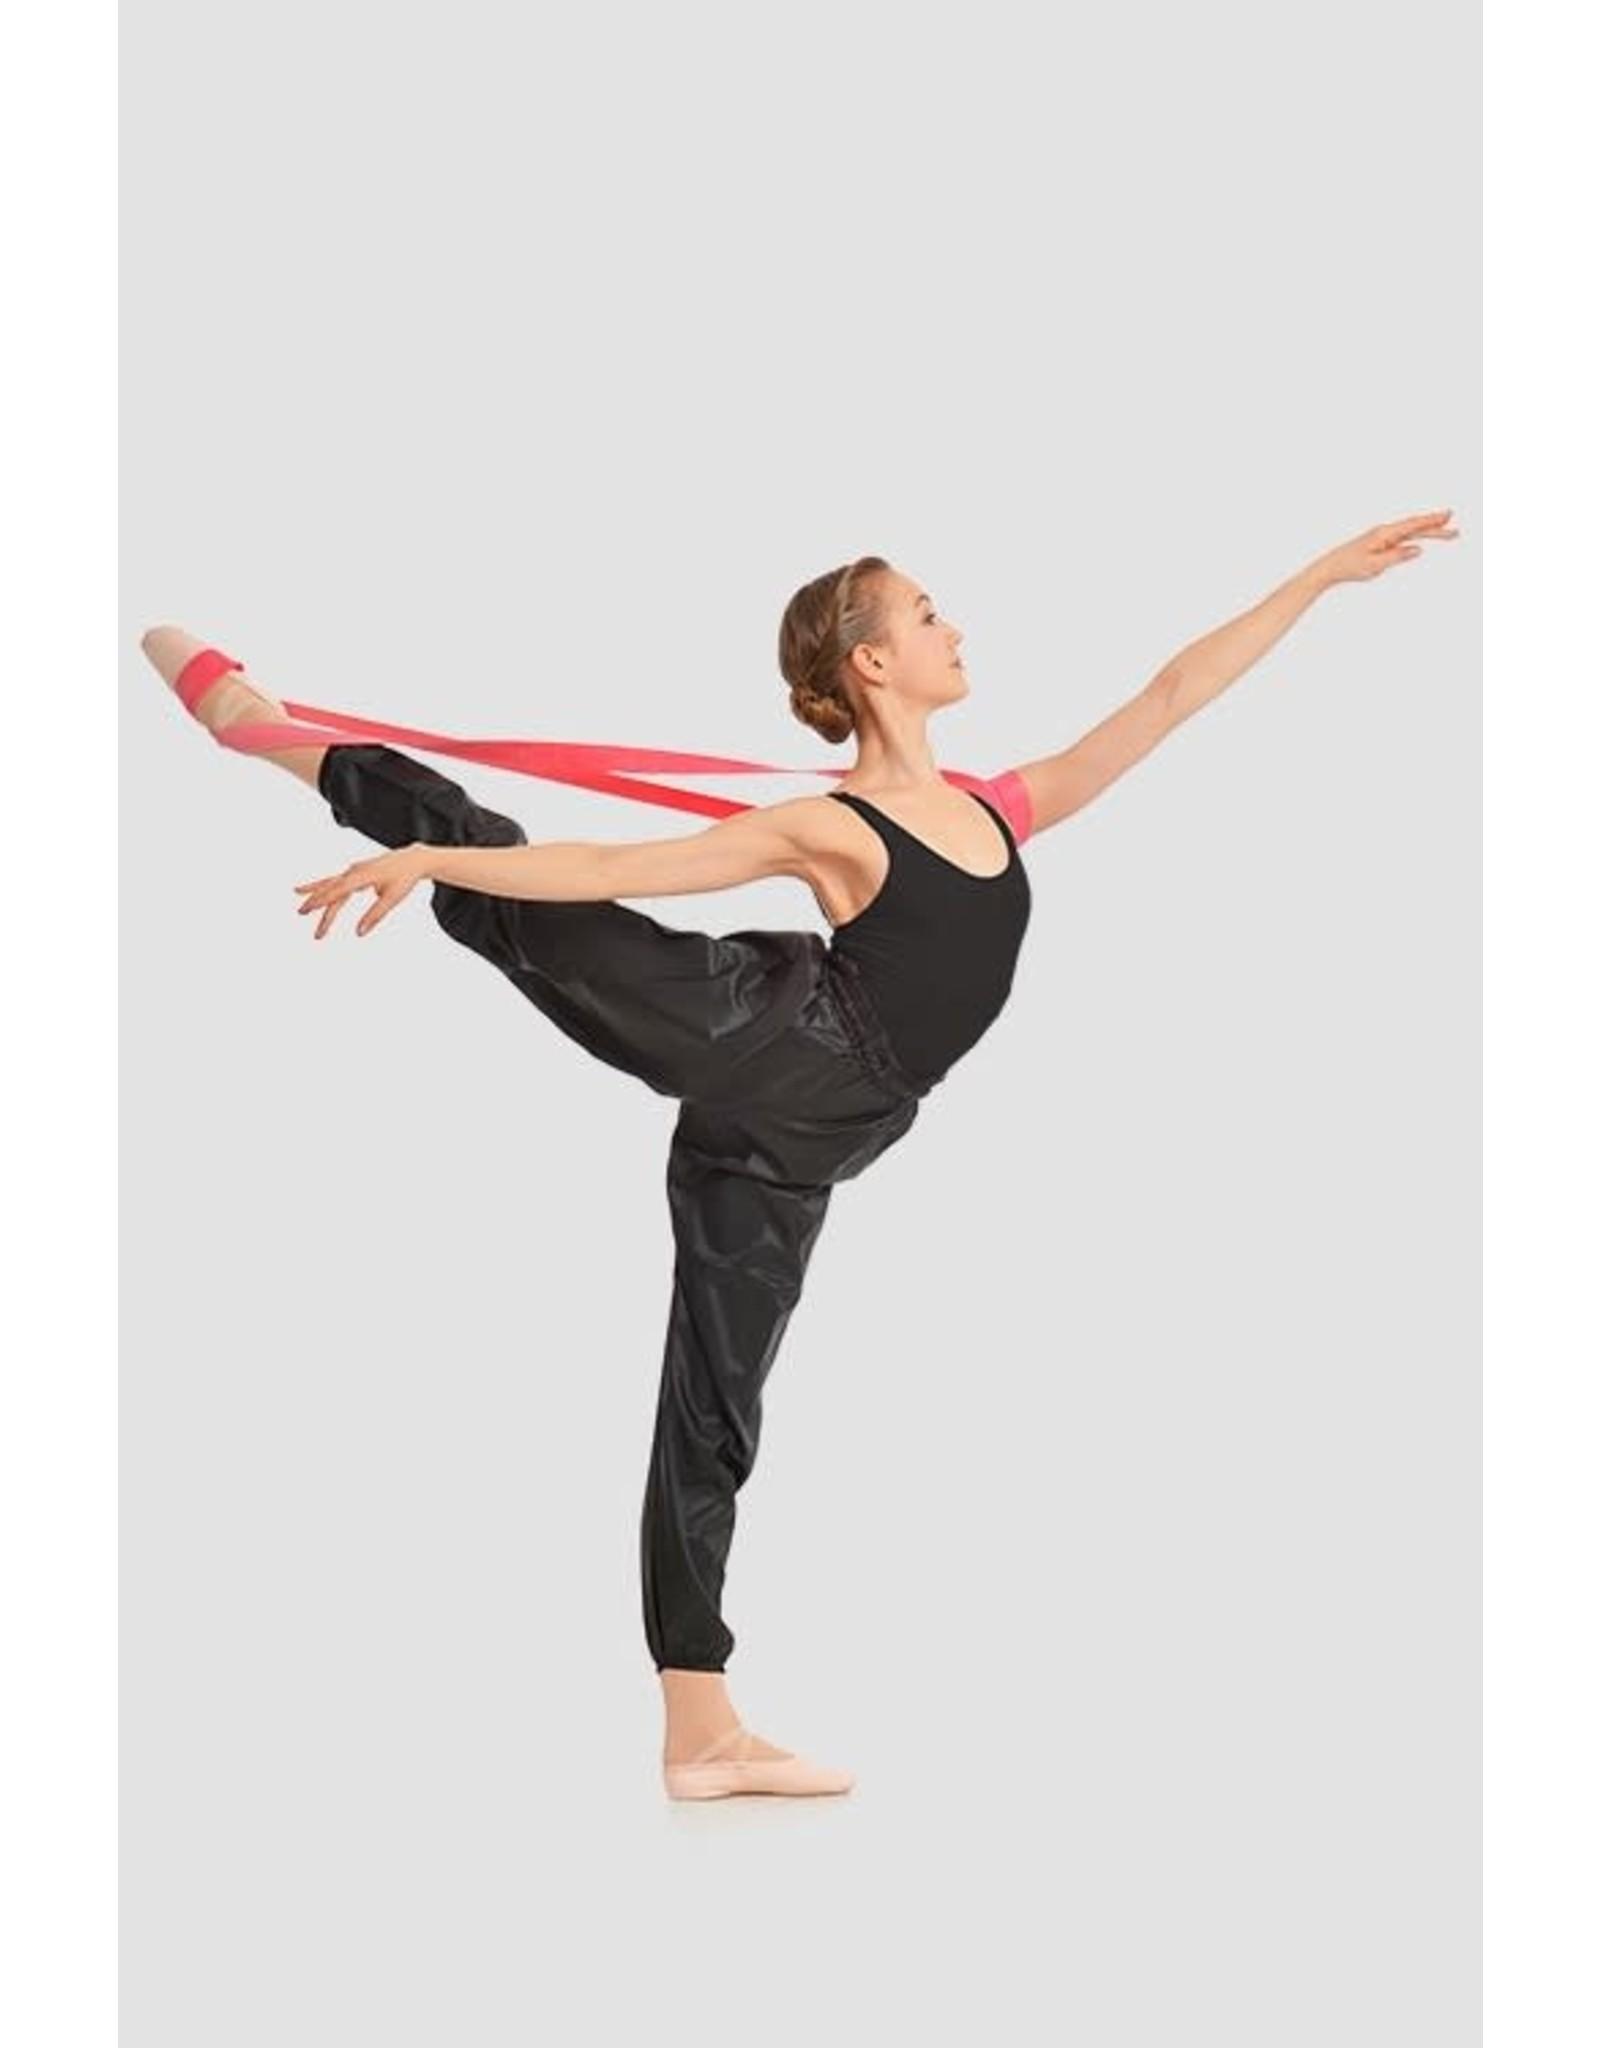 Gaynor Minden Gaynor Minden Flexibility Band (TA-F-110)